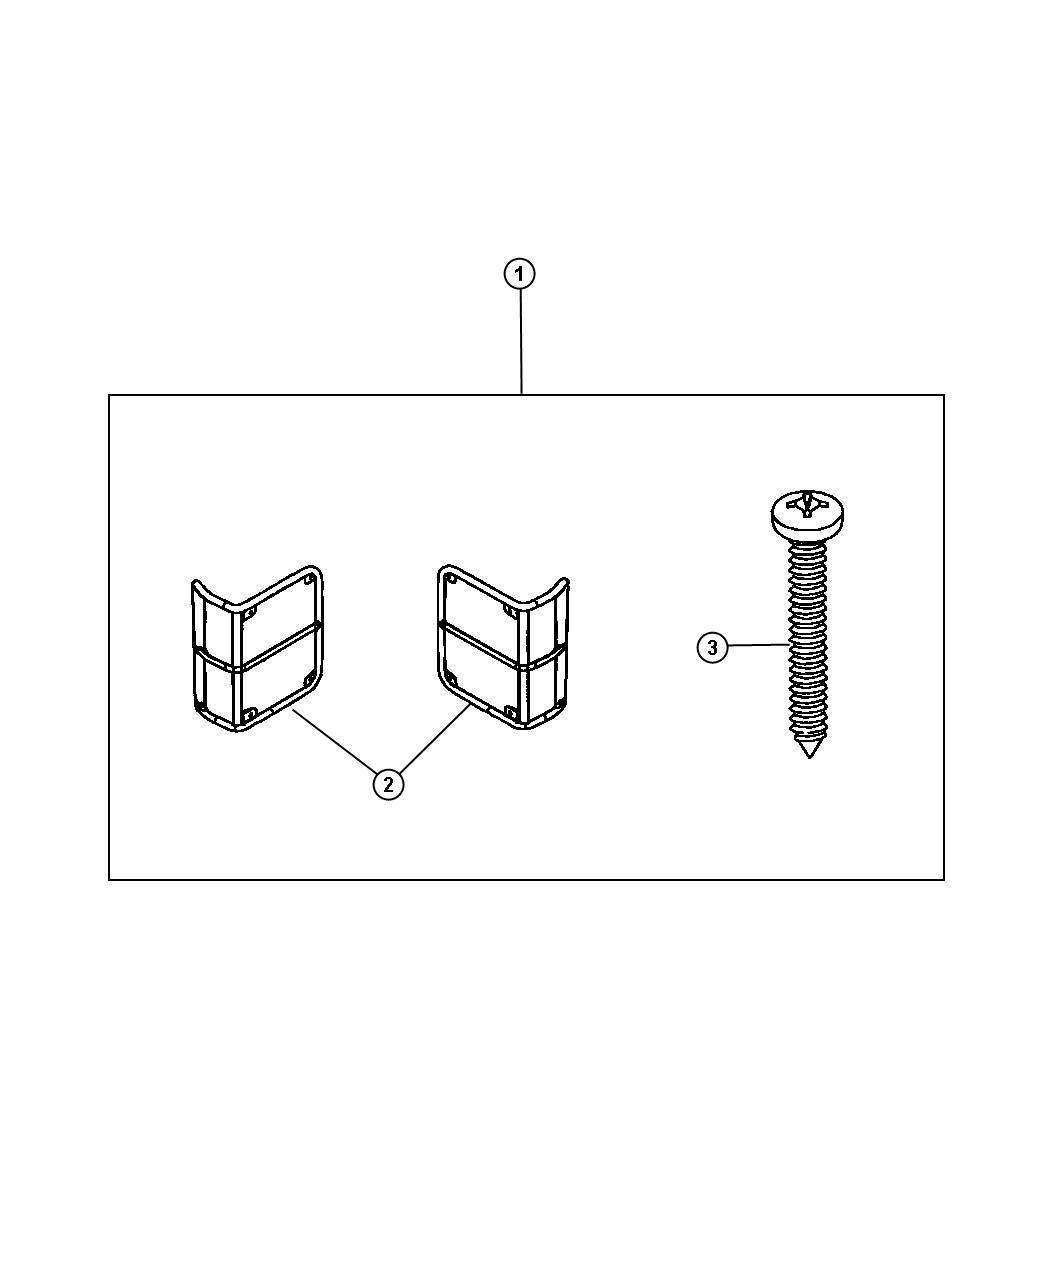 2011 Jeep Wrangler Screw. Tapping pan head. M4.2x1.70x45